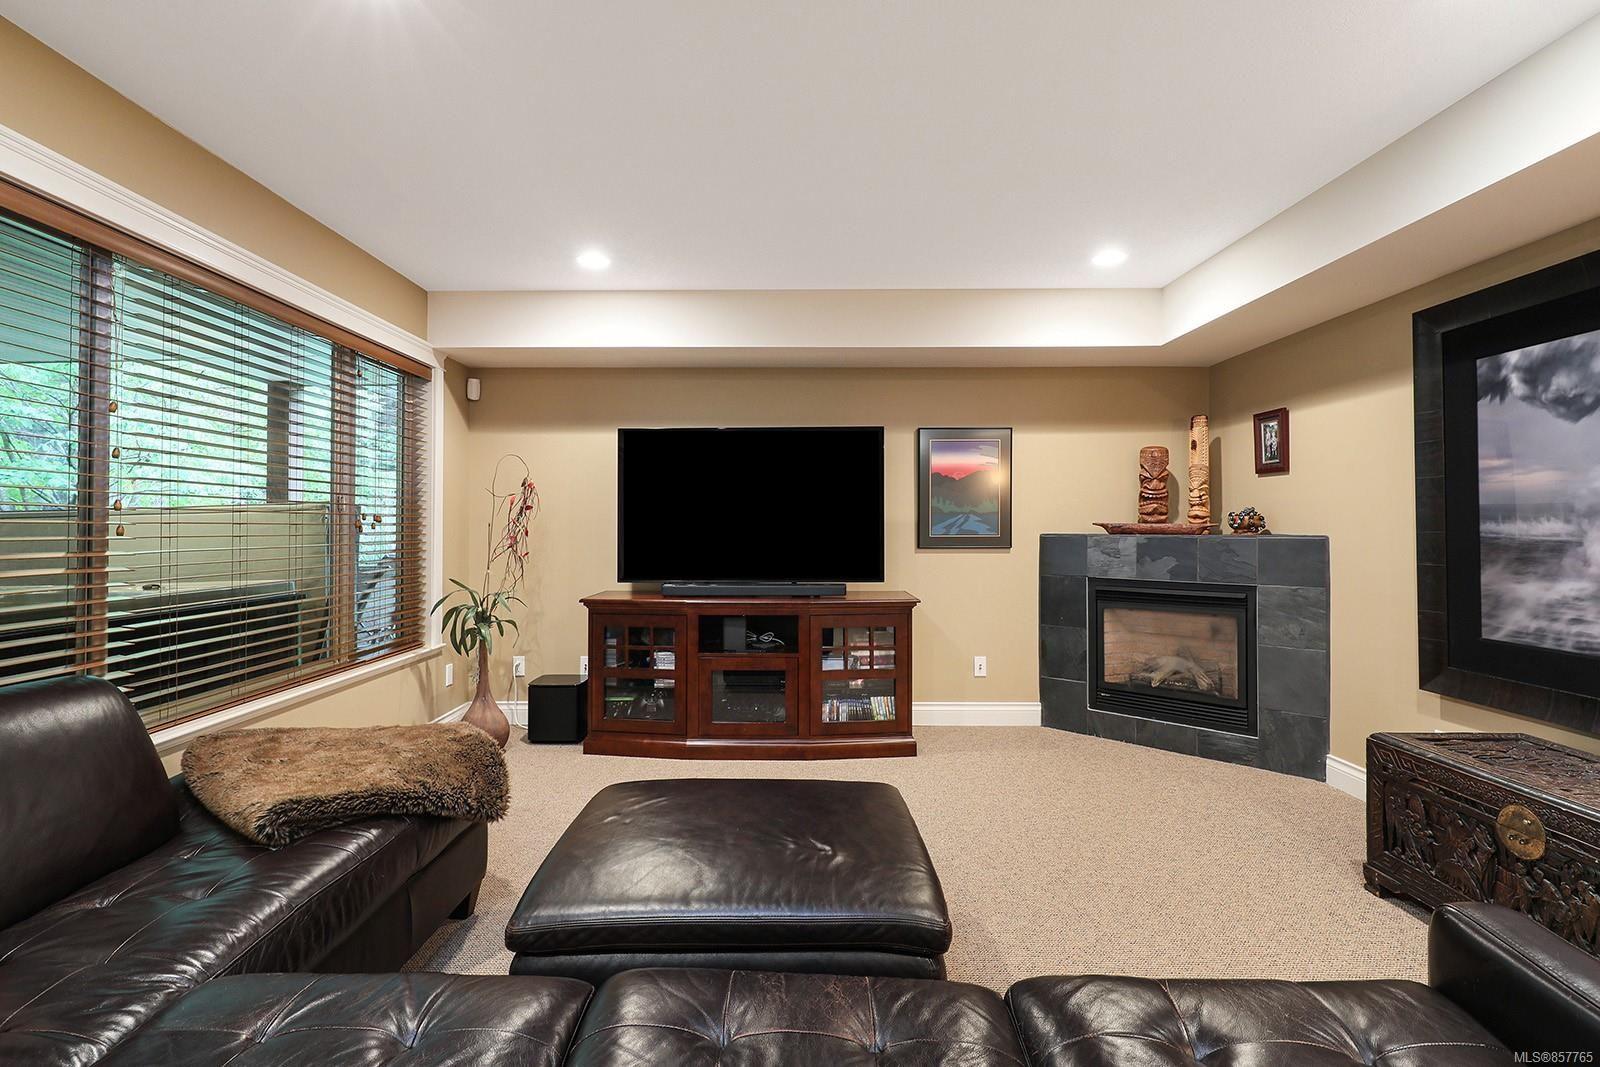 Photo 34: Photos: 1516 Highridge Dr in : CV Comox (Town of) House for sale (Comox Valley)  : MLS®# 857765